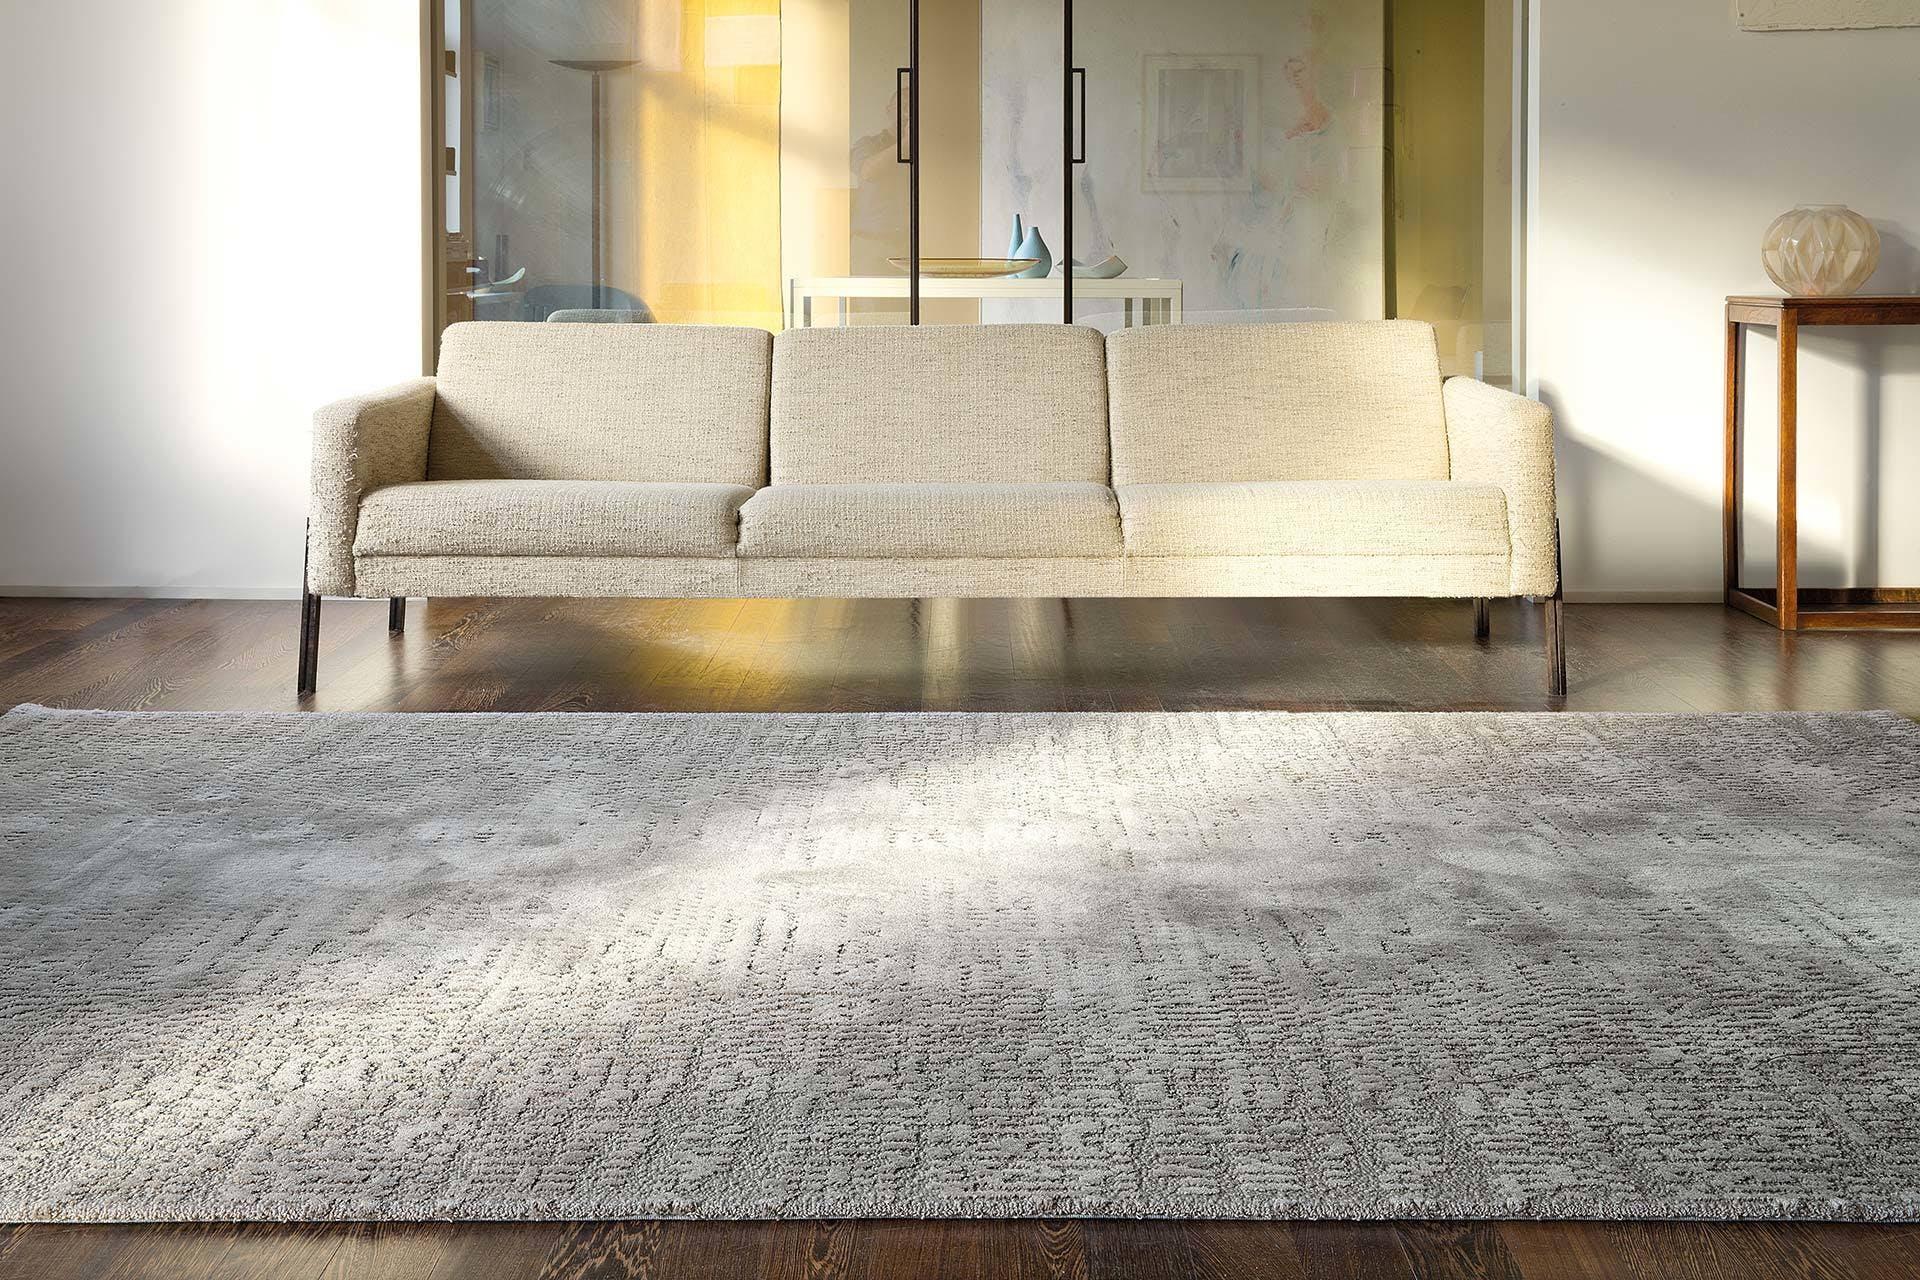 Maestro Matrix Moonbeam Sfeerbeeld Limited Edition Carpets